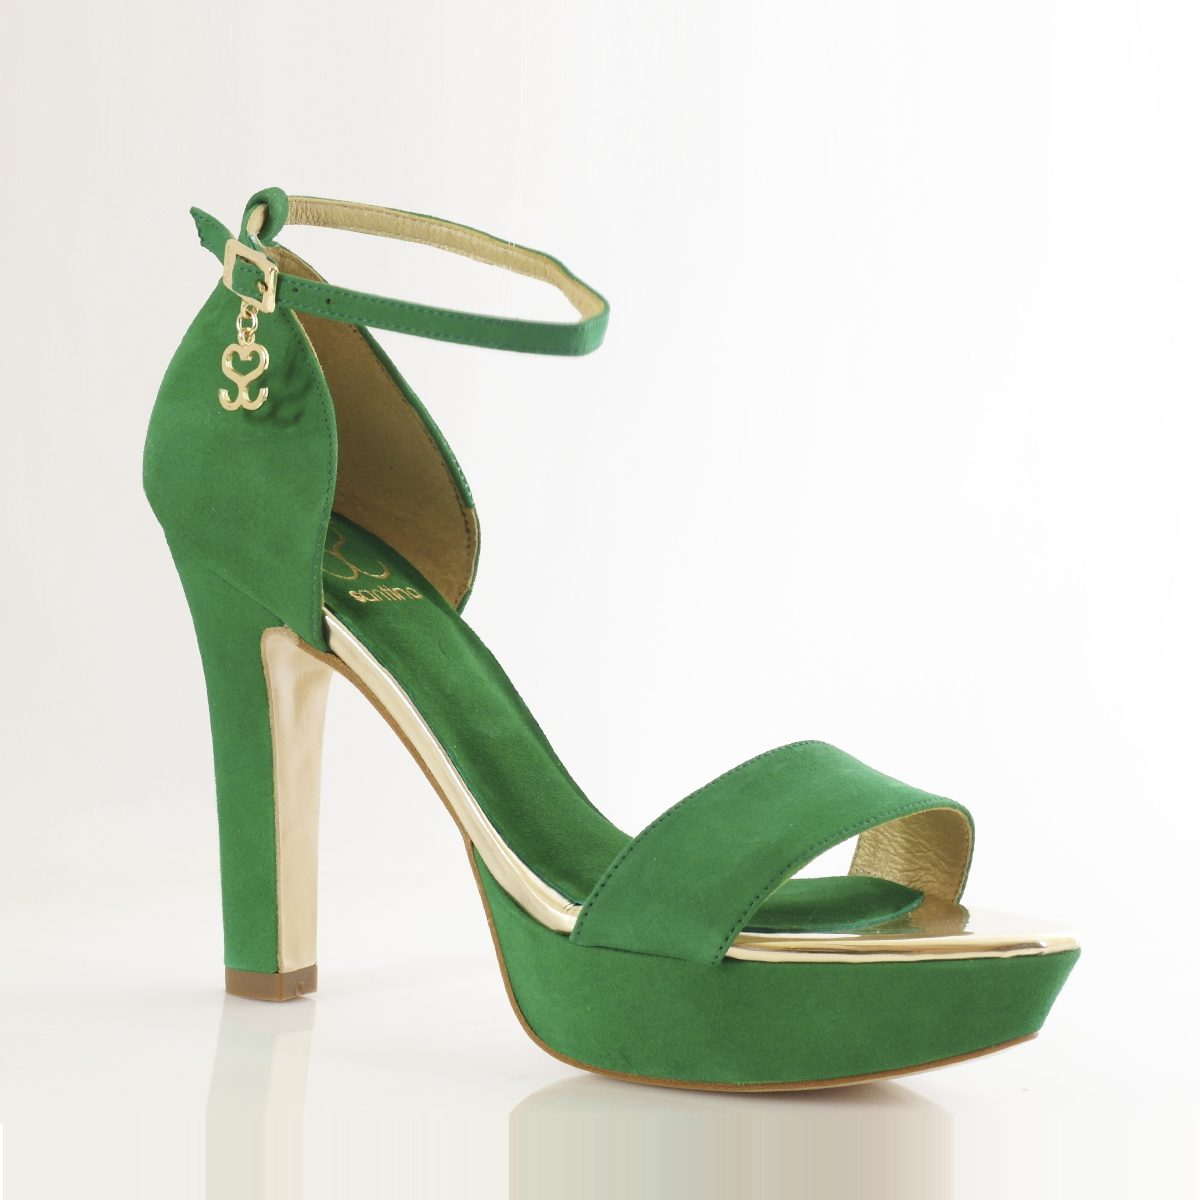 SANDALIA MOD.1378 (10,5cm) - zapatos perosnaliados fiesta